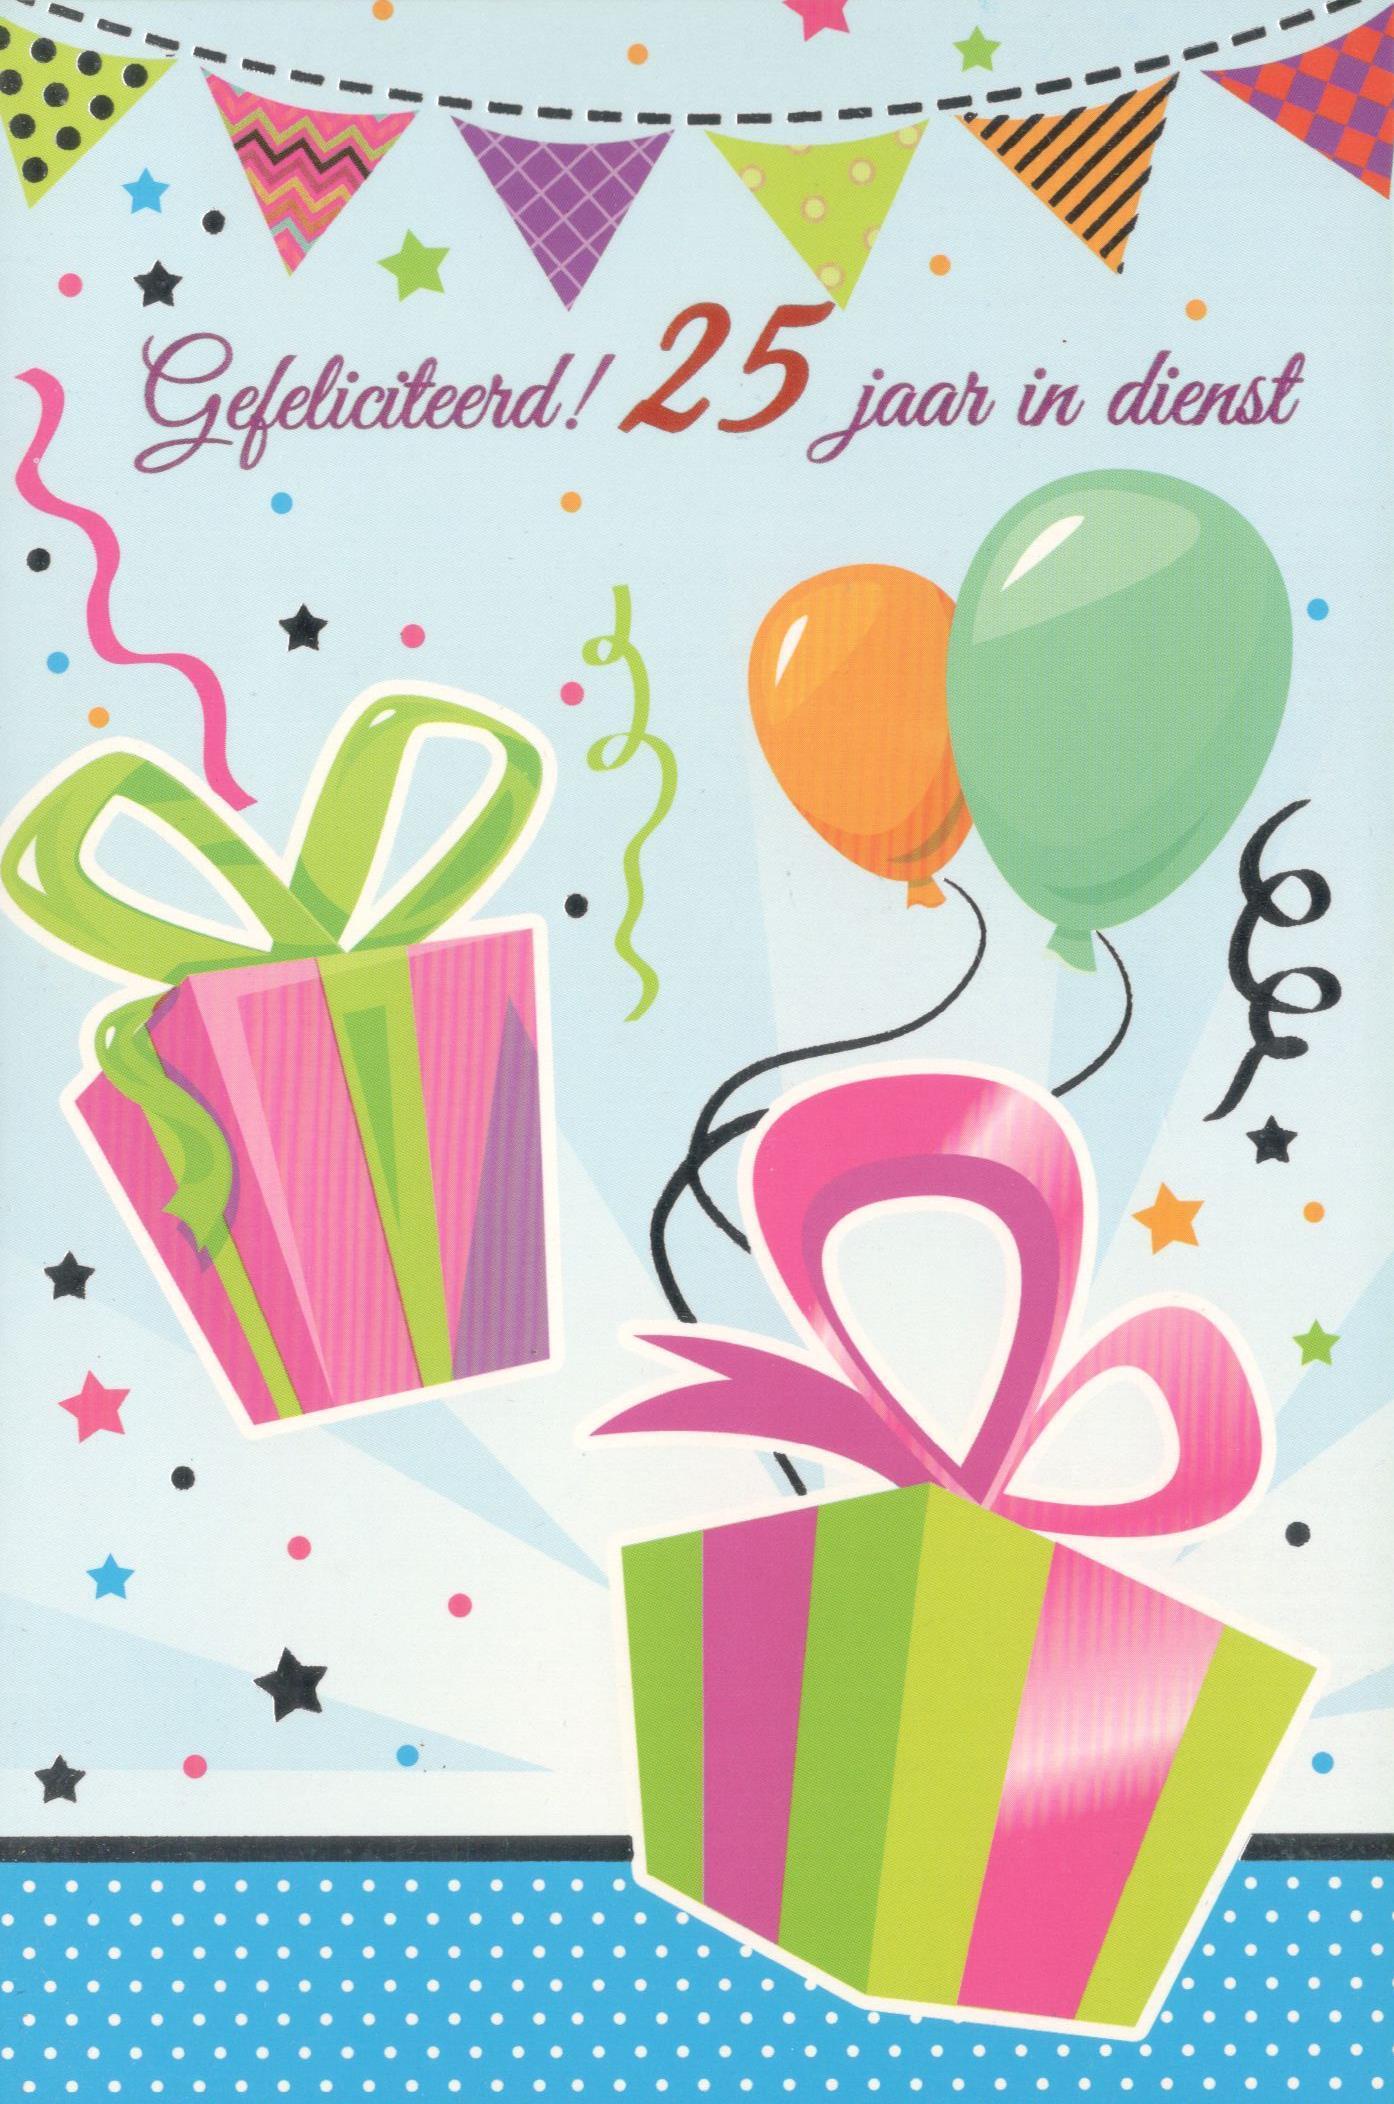 Gedichten Jubileum 40 Jaar In Dienst